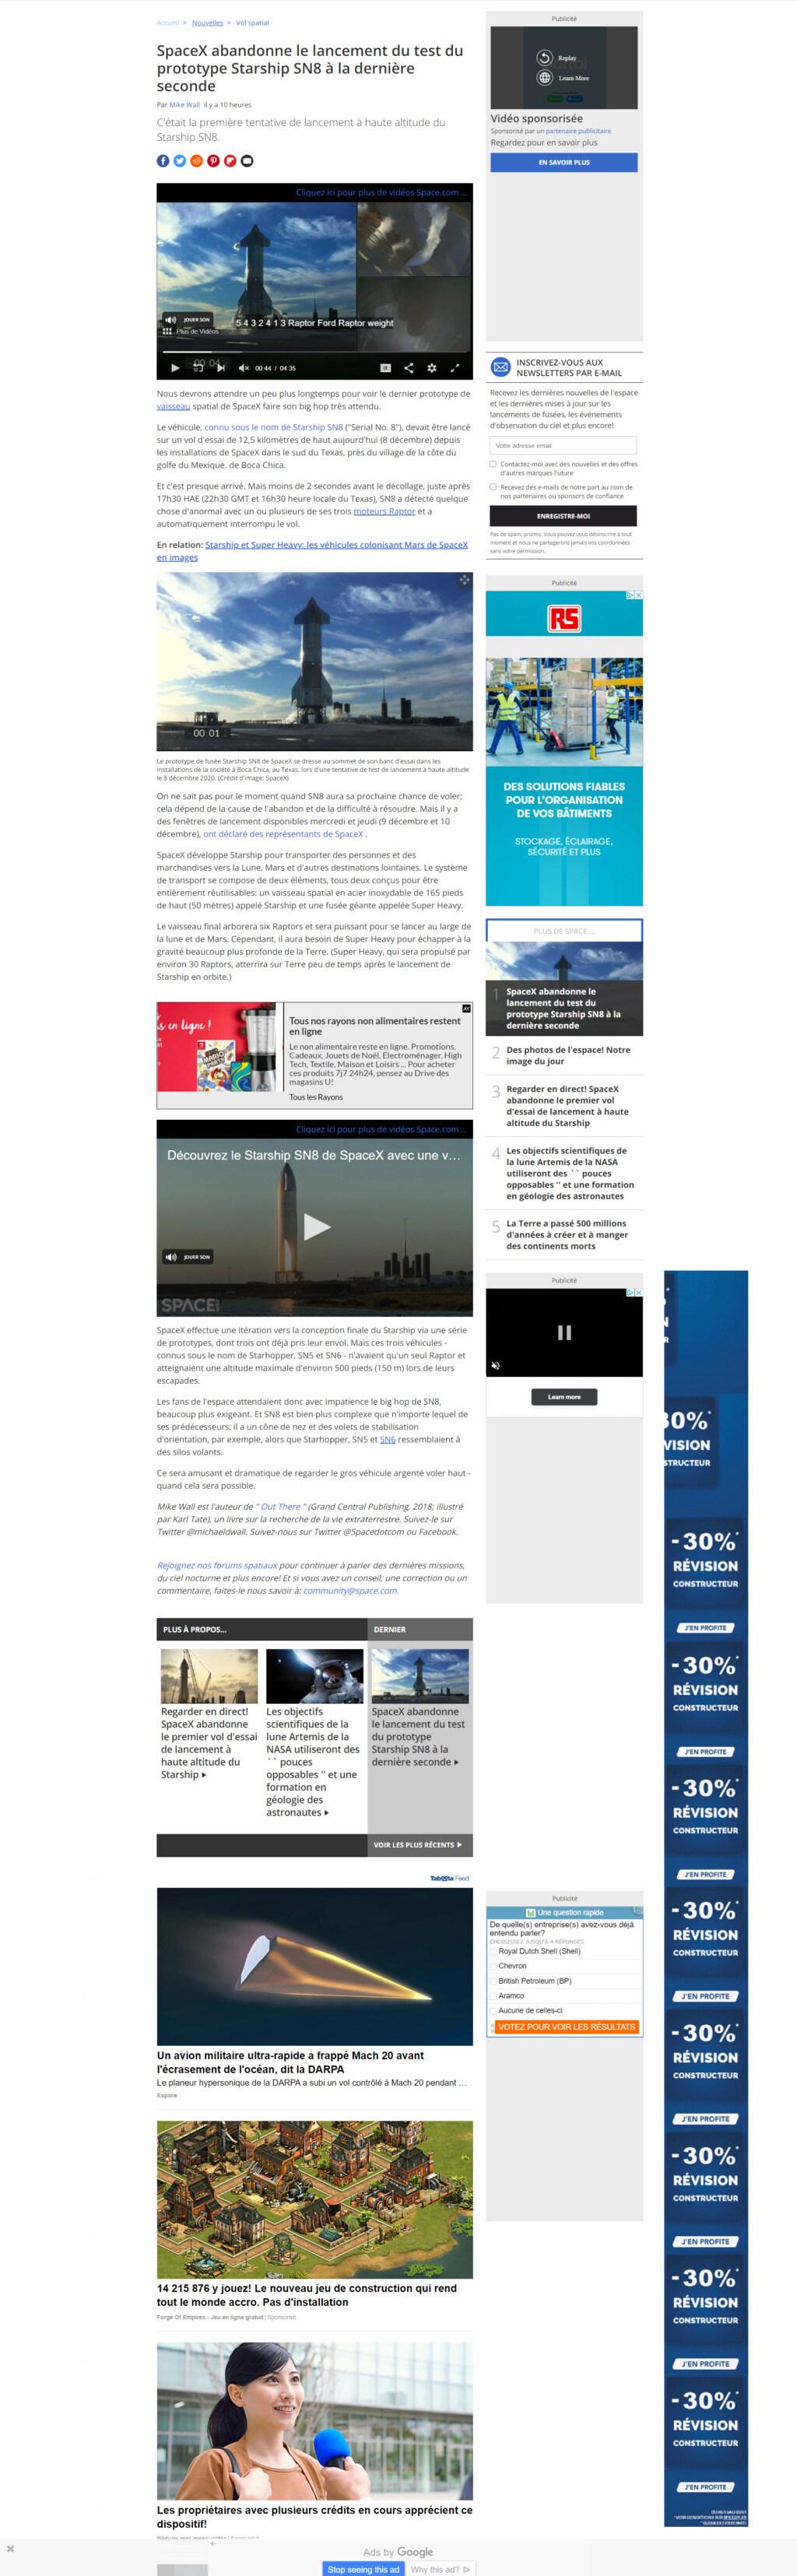 Starship SN8 (Boca Chica) (1/2) - Page 39 Starsh13